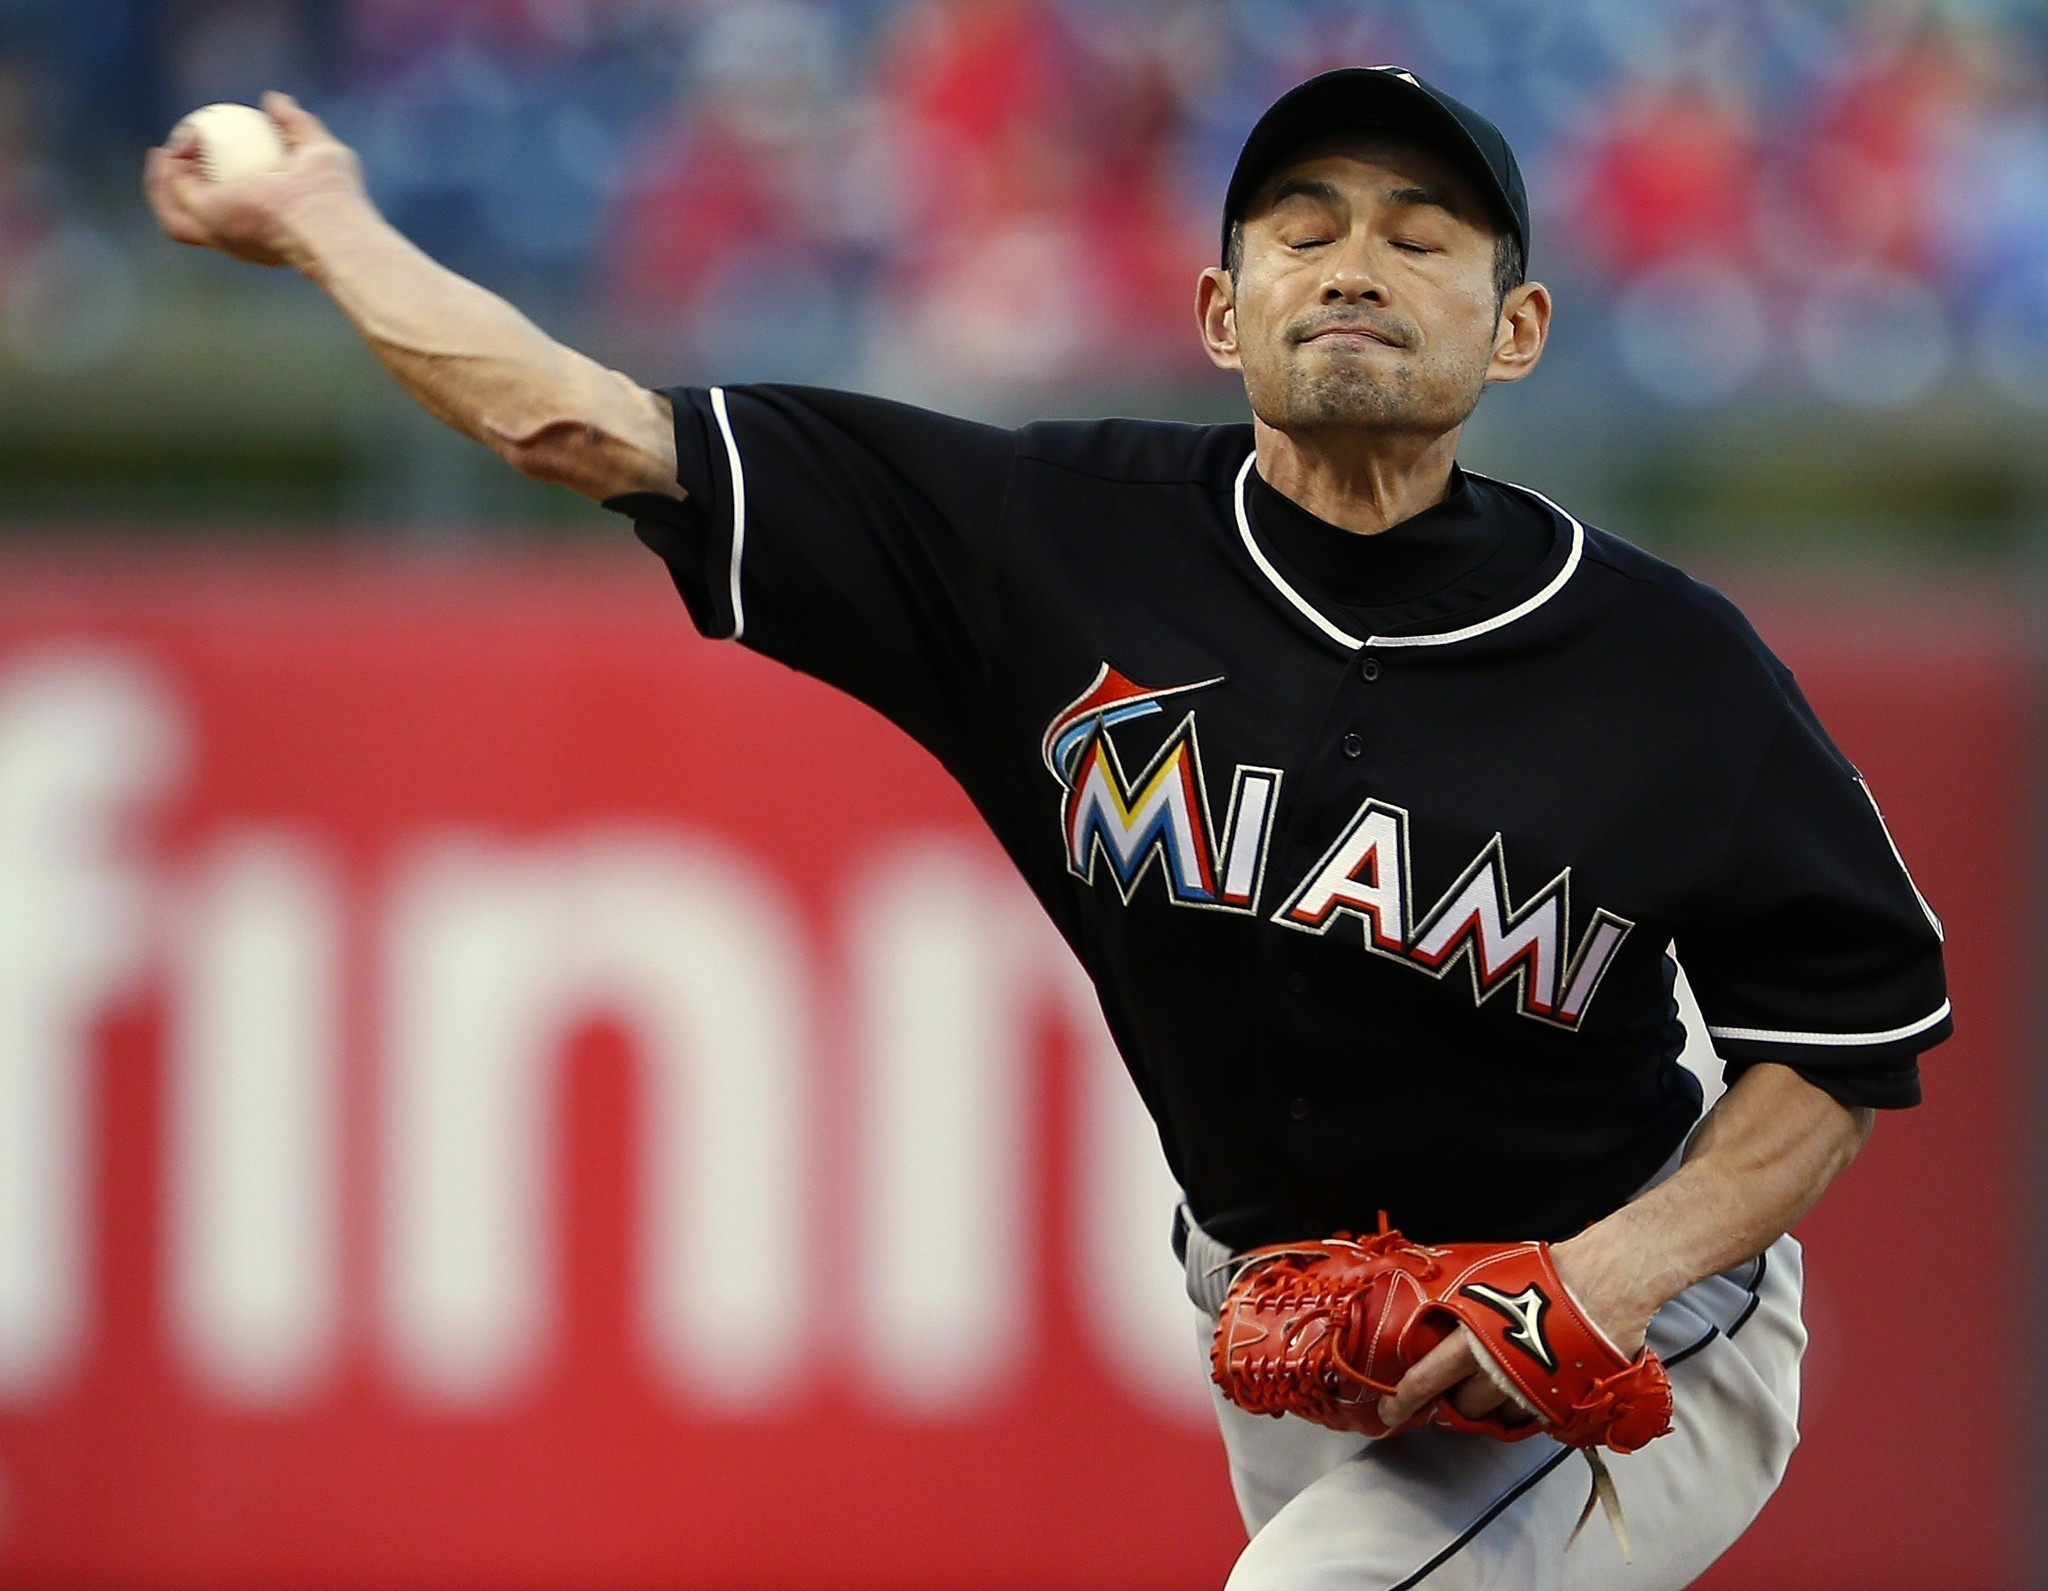 Ichiro Suzuki shows his stuff in surprise pitching debut for Marlins